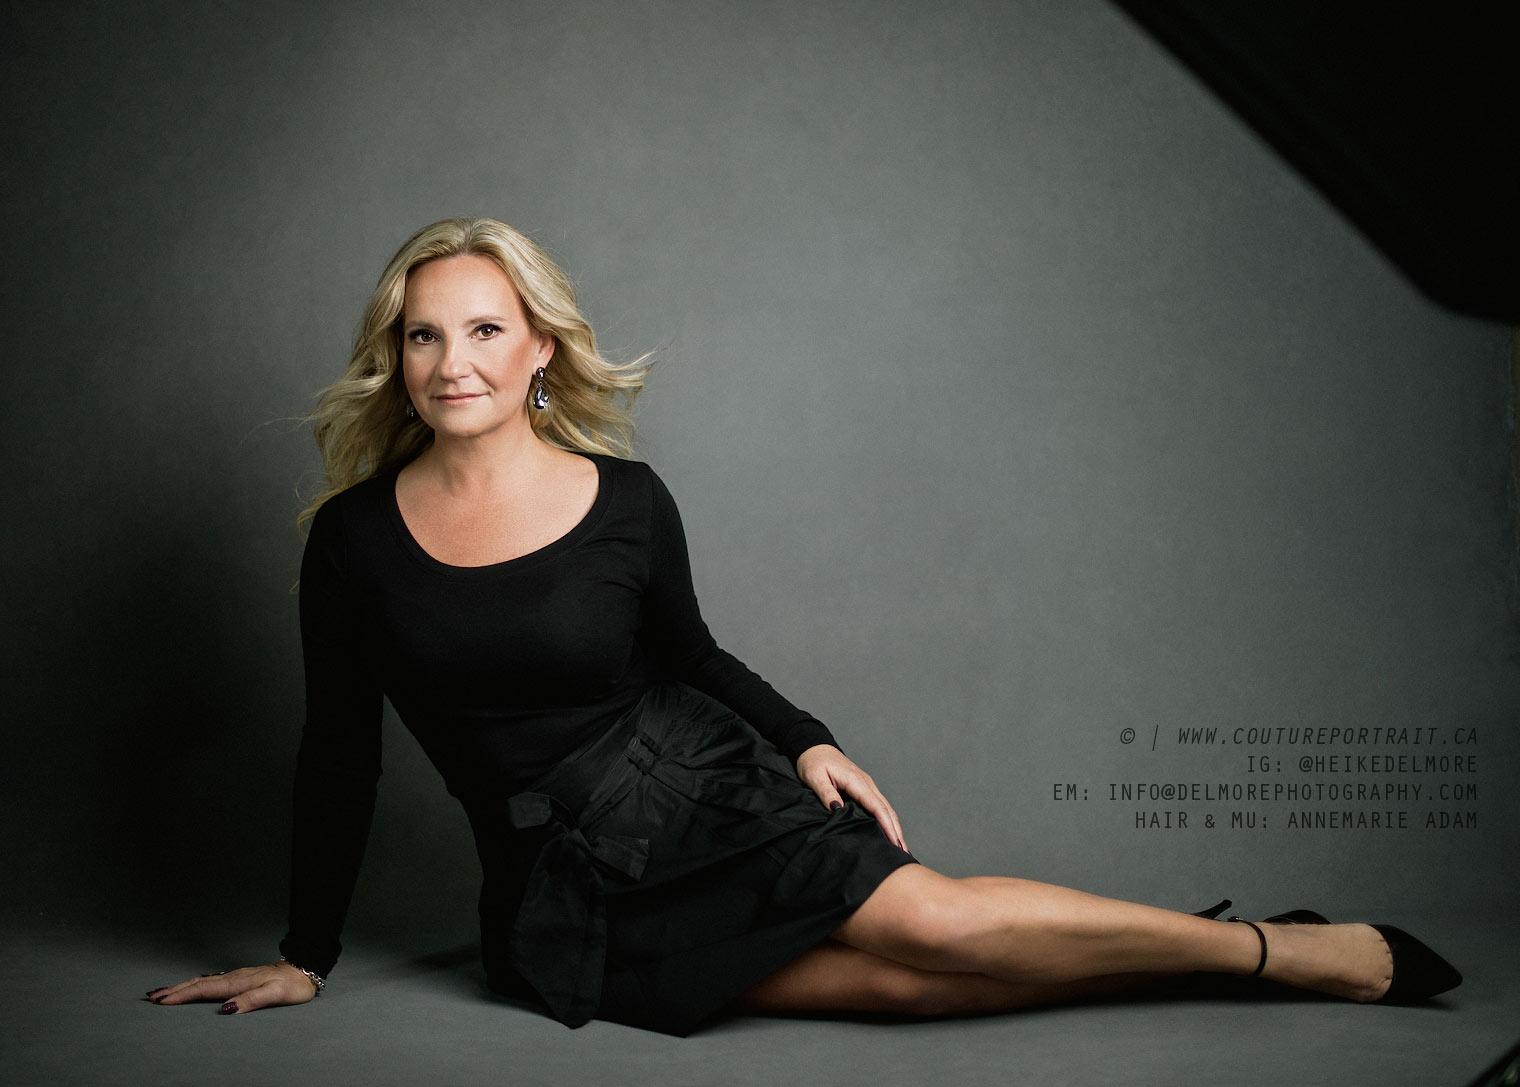 Women's Portrait Photography by Heike Delmore